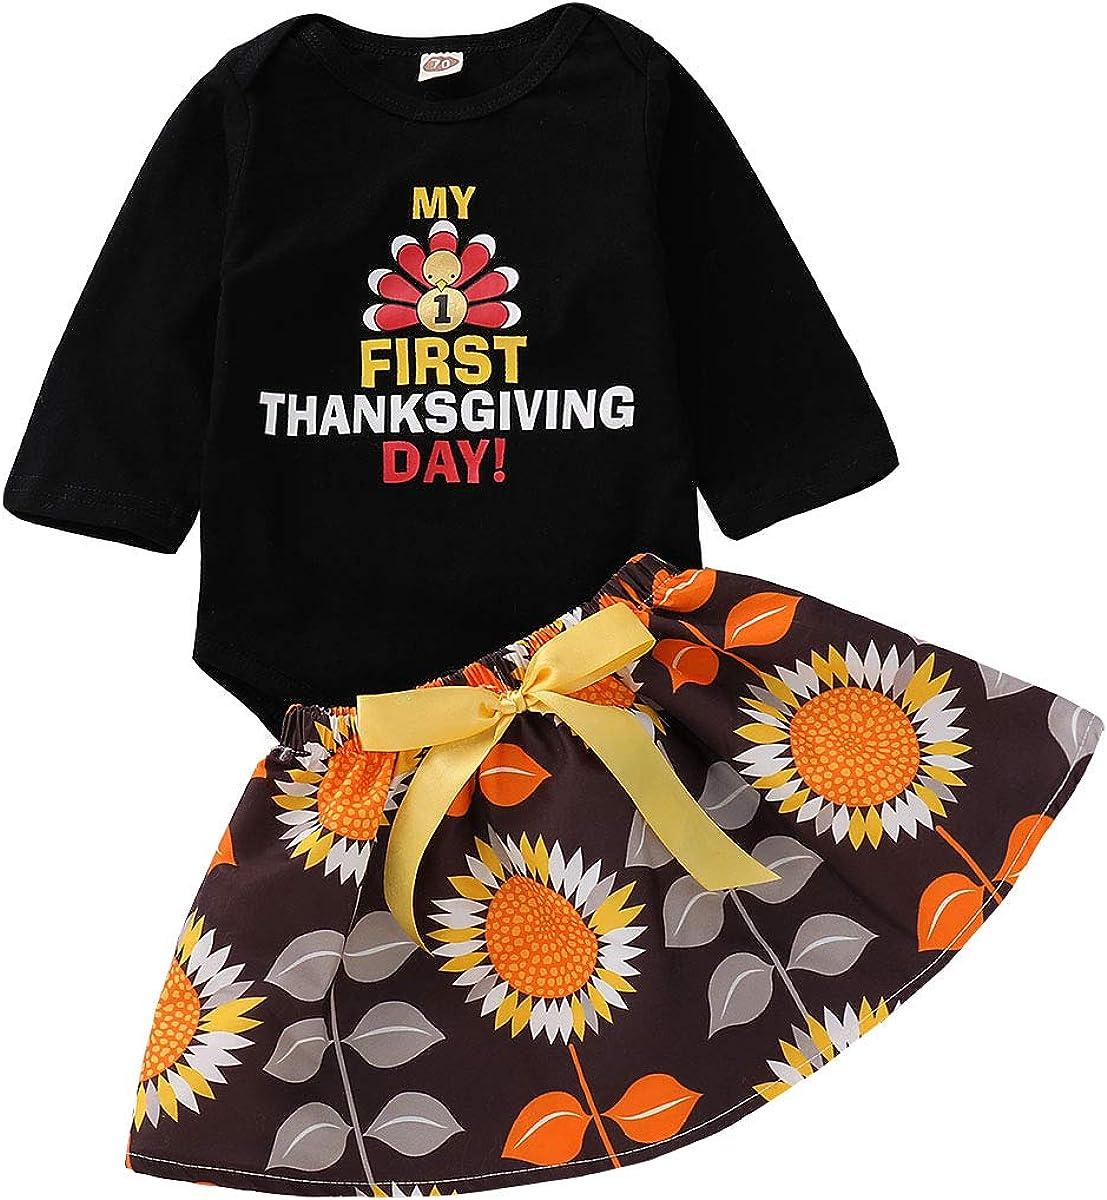 Thankgiving Baby Girl Skirt Set My 1st Turkey Day Romper Top Tut